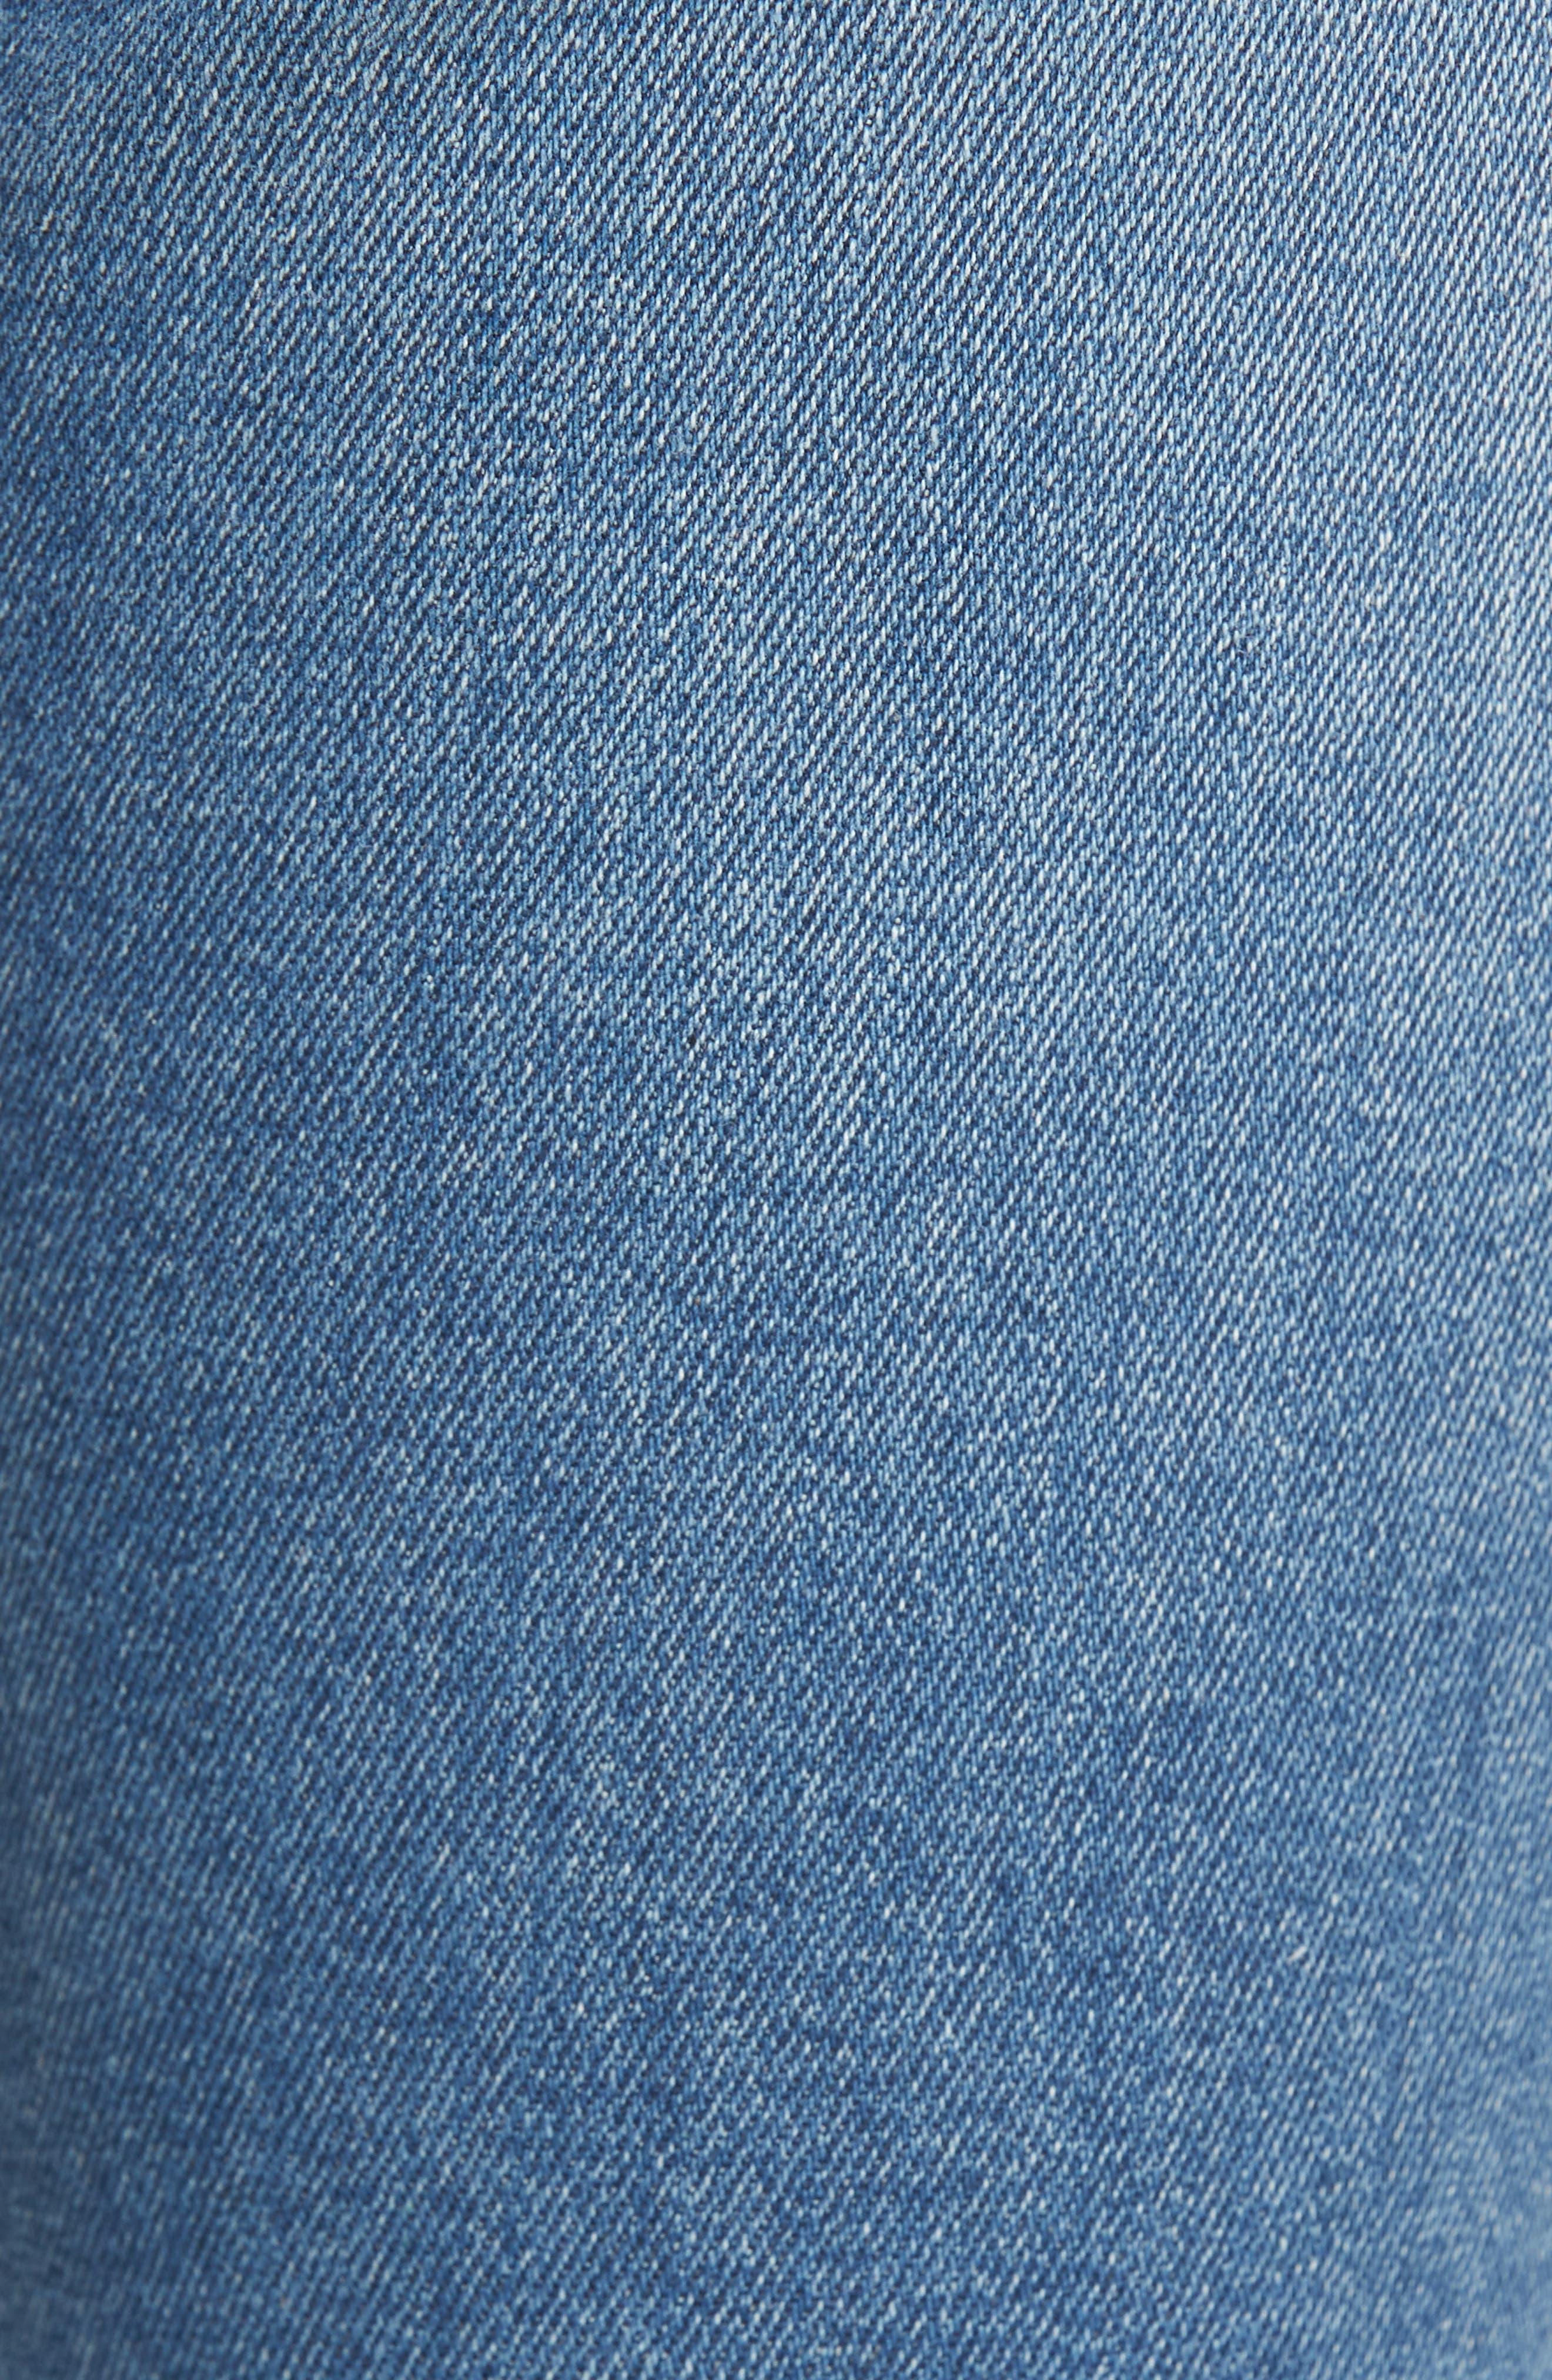 Marley Raw Hem Super Skinny Jeans,                             Alternate thumbnail 6, color,                             461